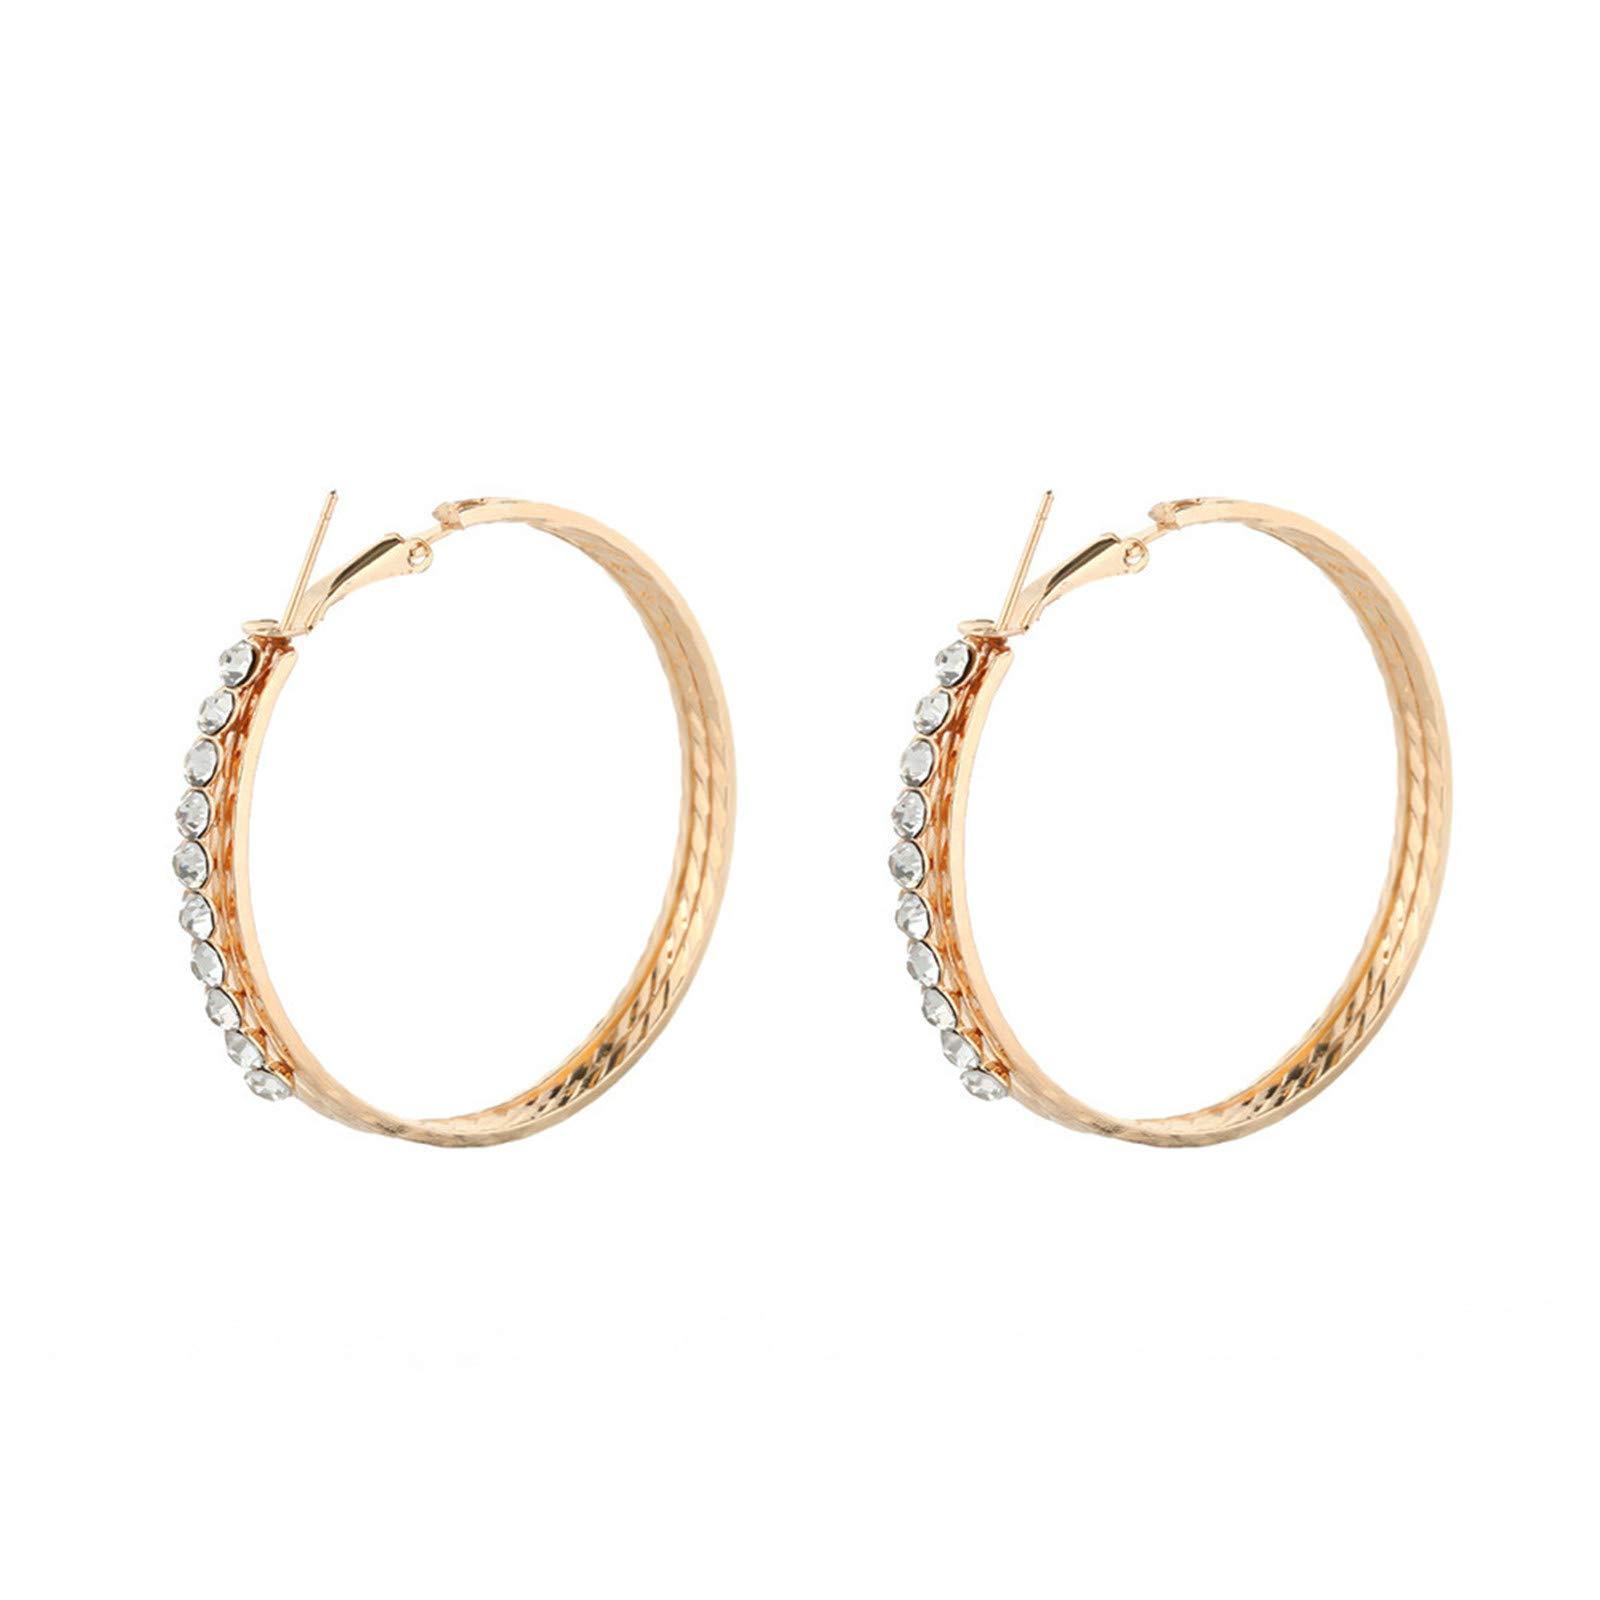 BOOBODA Fashion Crystal Rounded Rhinestone Ear Clip Jewelry Ear Stud Diamond Earrings for Women/Girls(Gold)